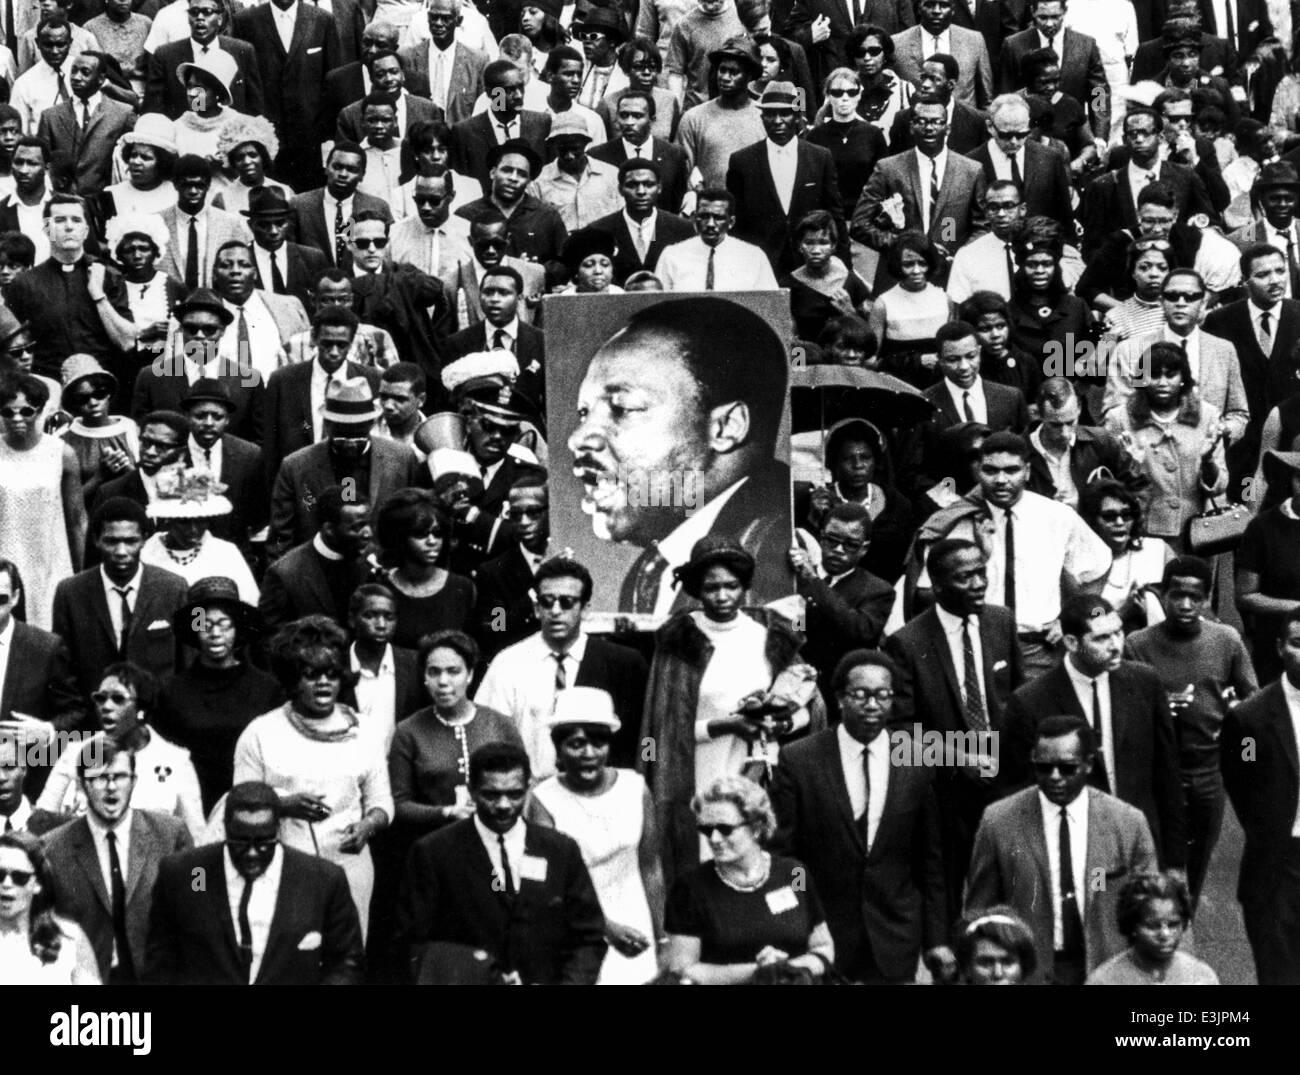 martin luther king's funeral,Atlanta, Georgia April 9, 1968 - Stock Image